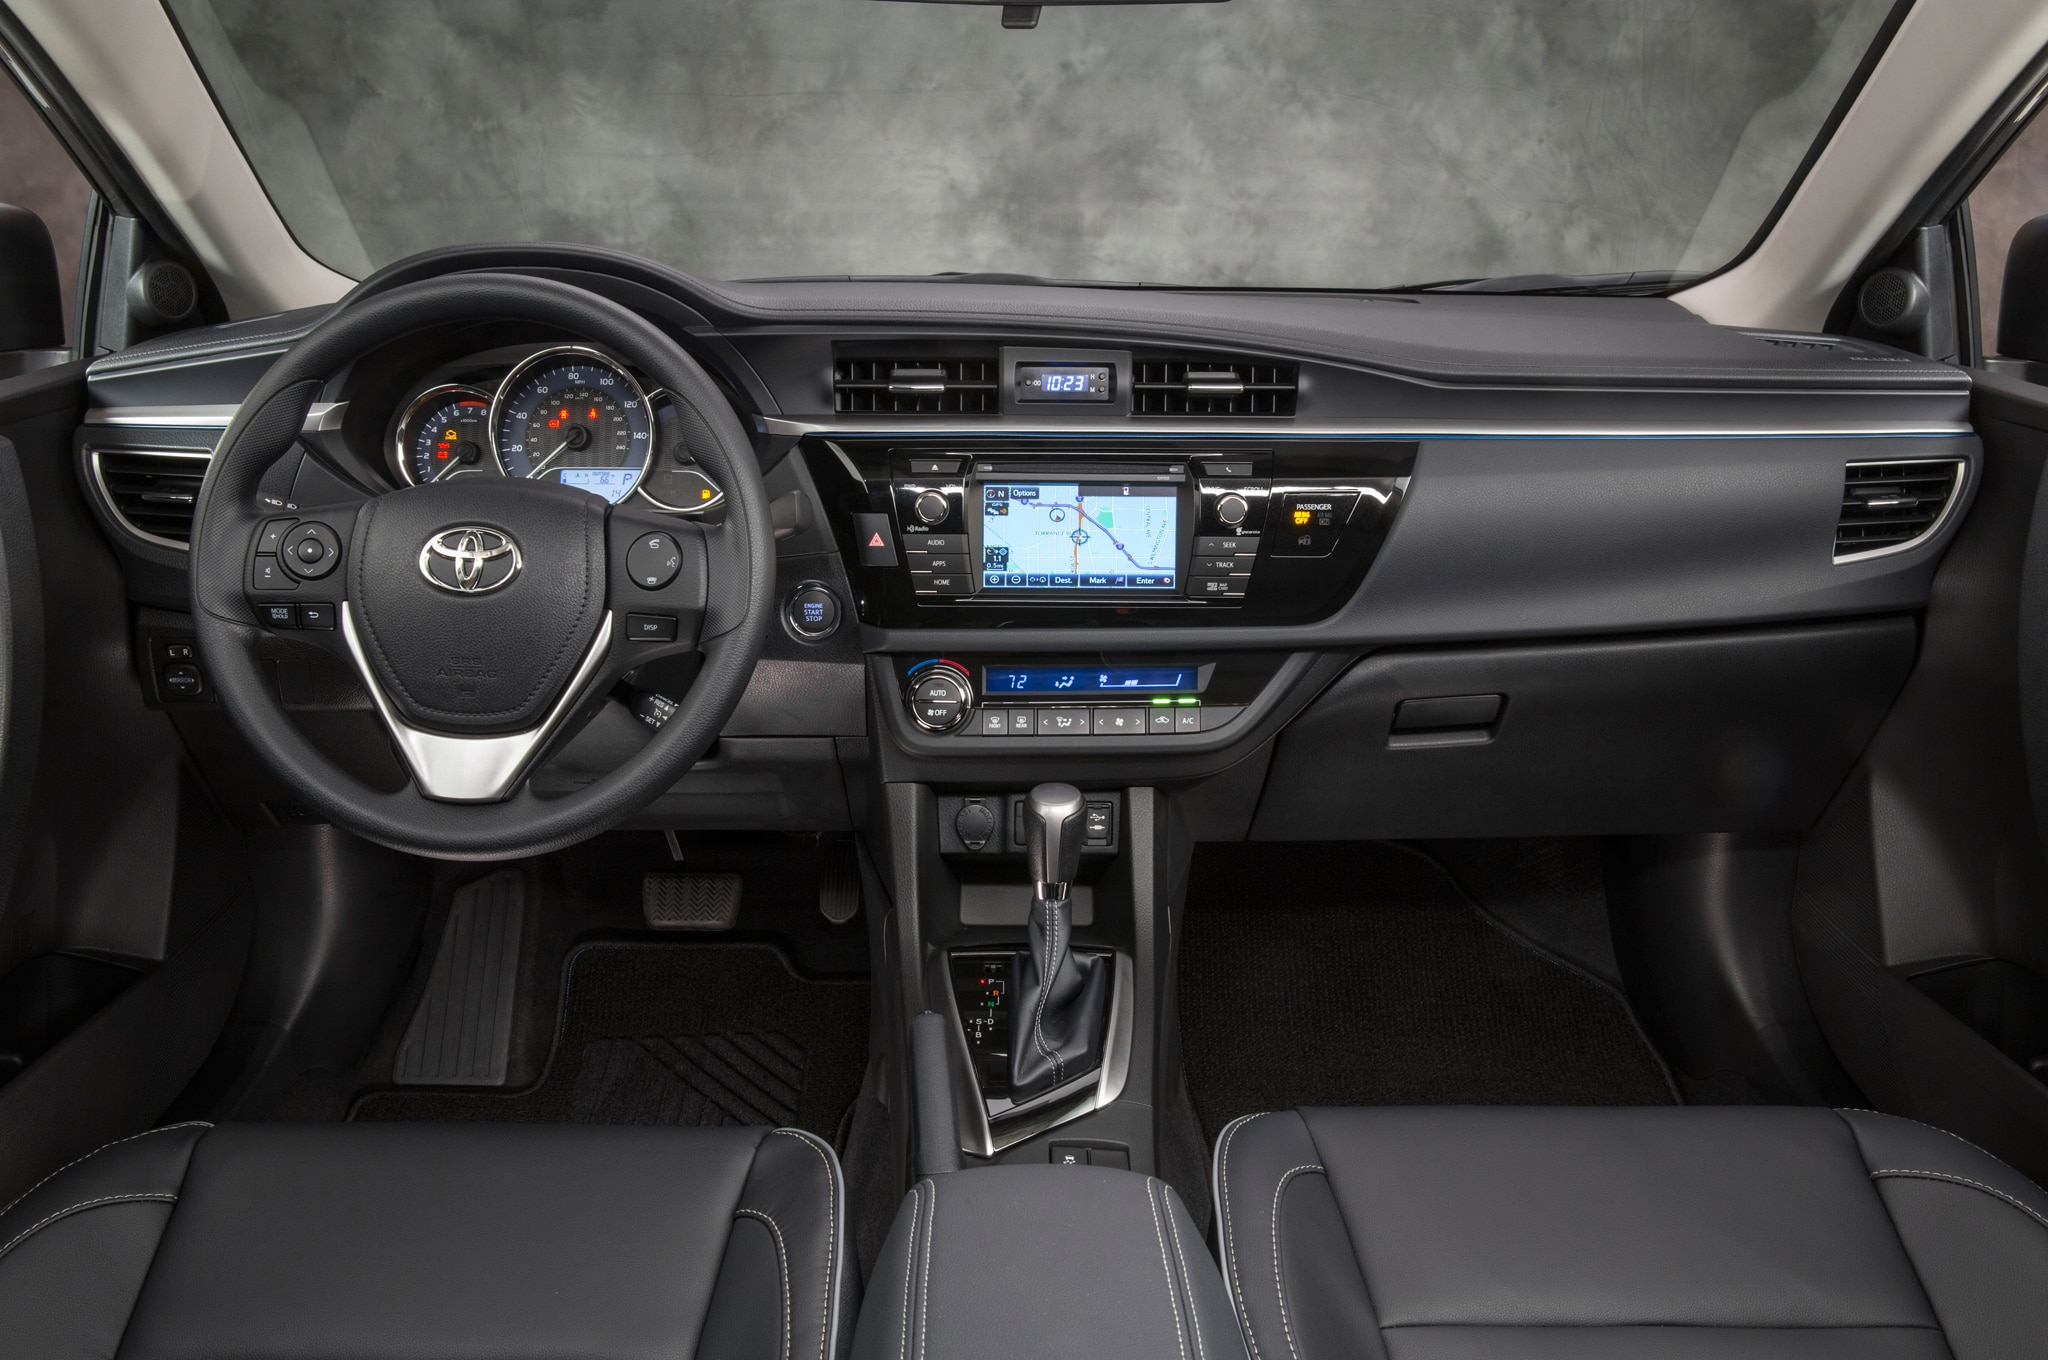 Exceptional 2014 Toyota Corolla LE Eco